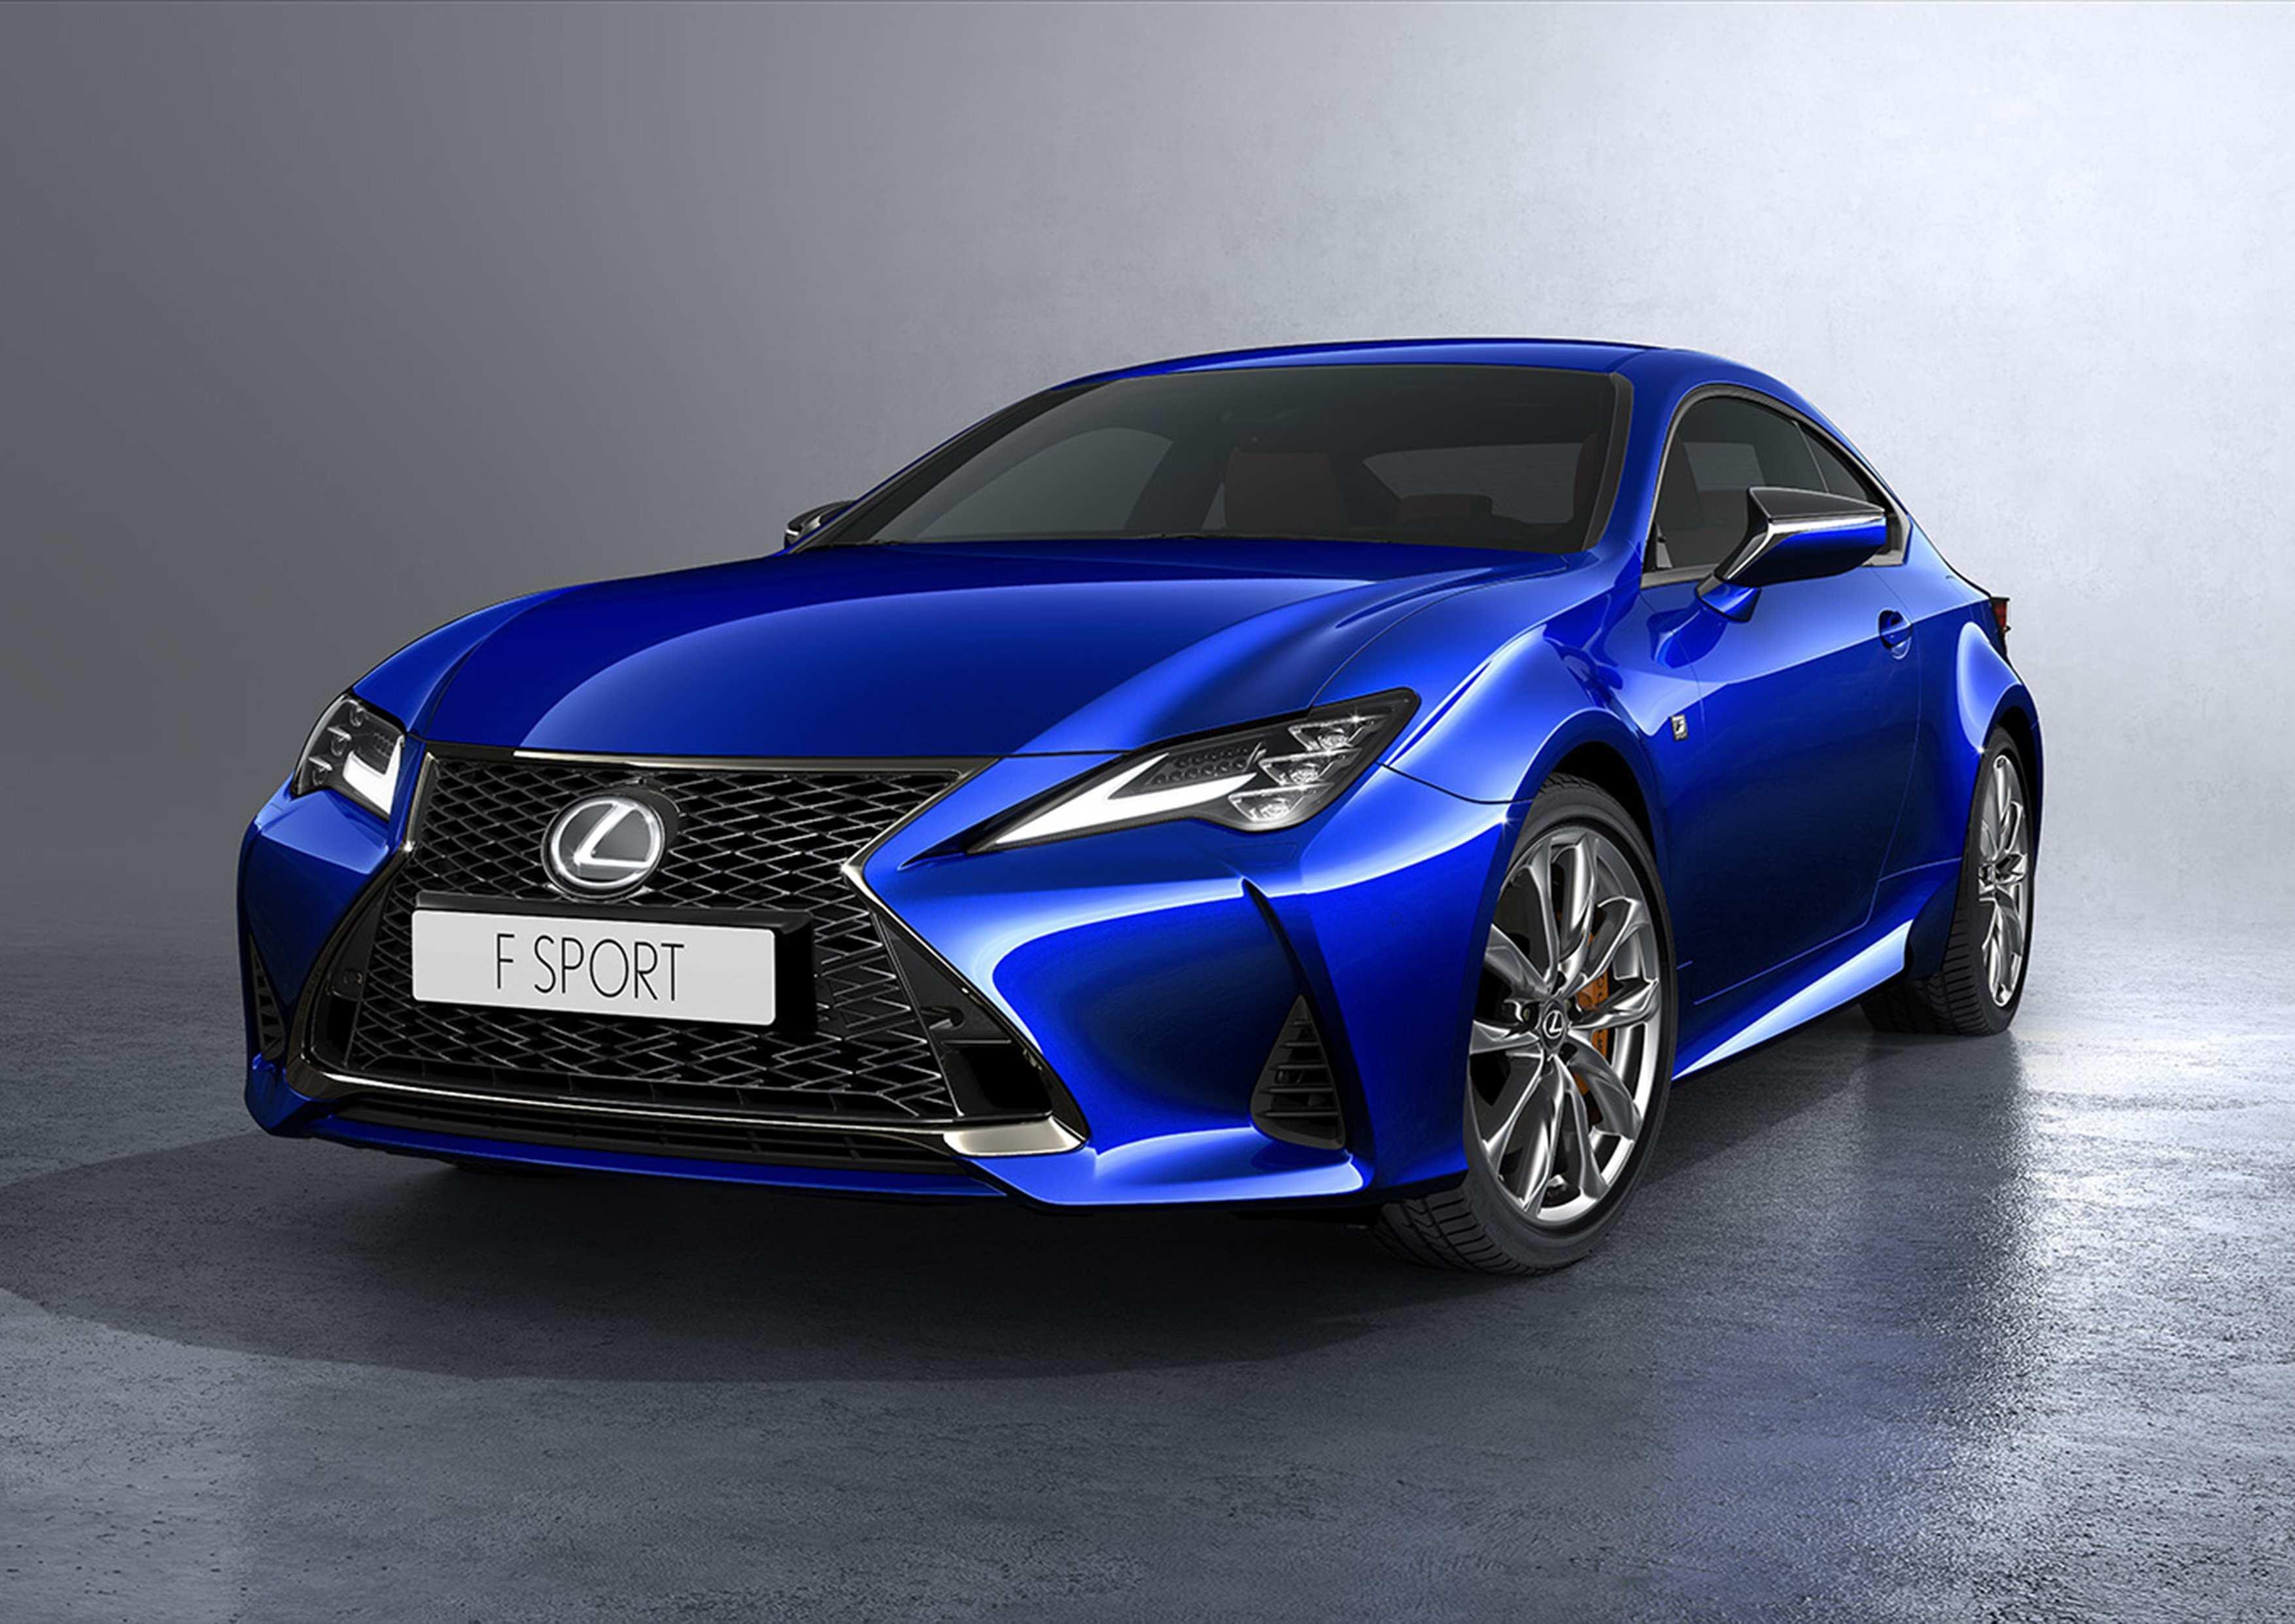 93 All New Lexus 2020 Vehicles Spy Shoot for Lexus 2020 Vehicles